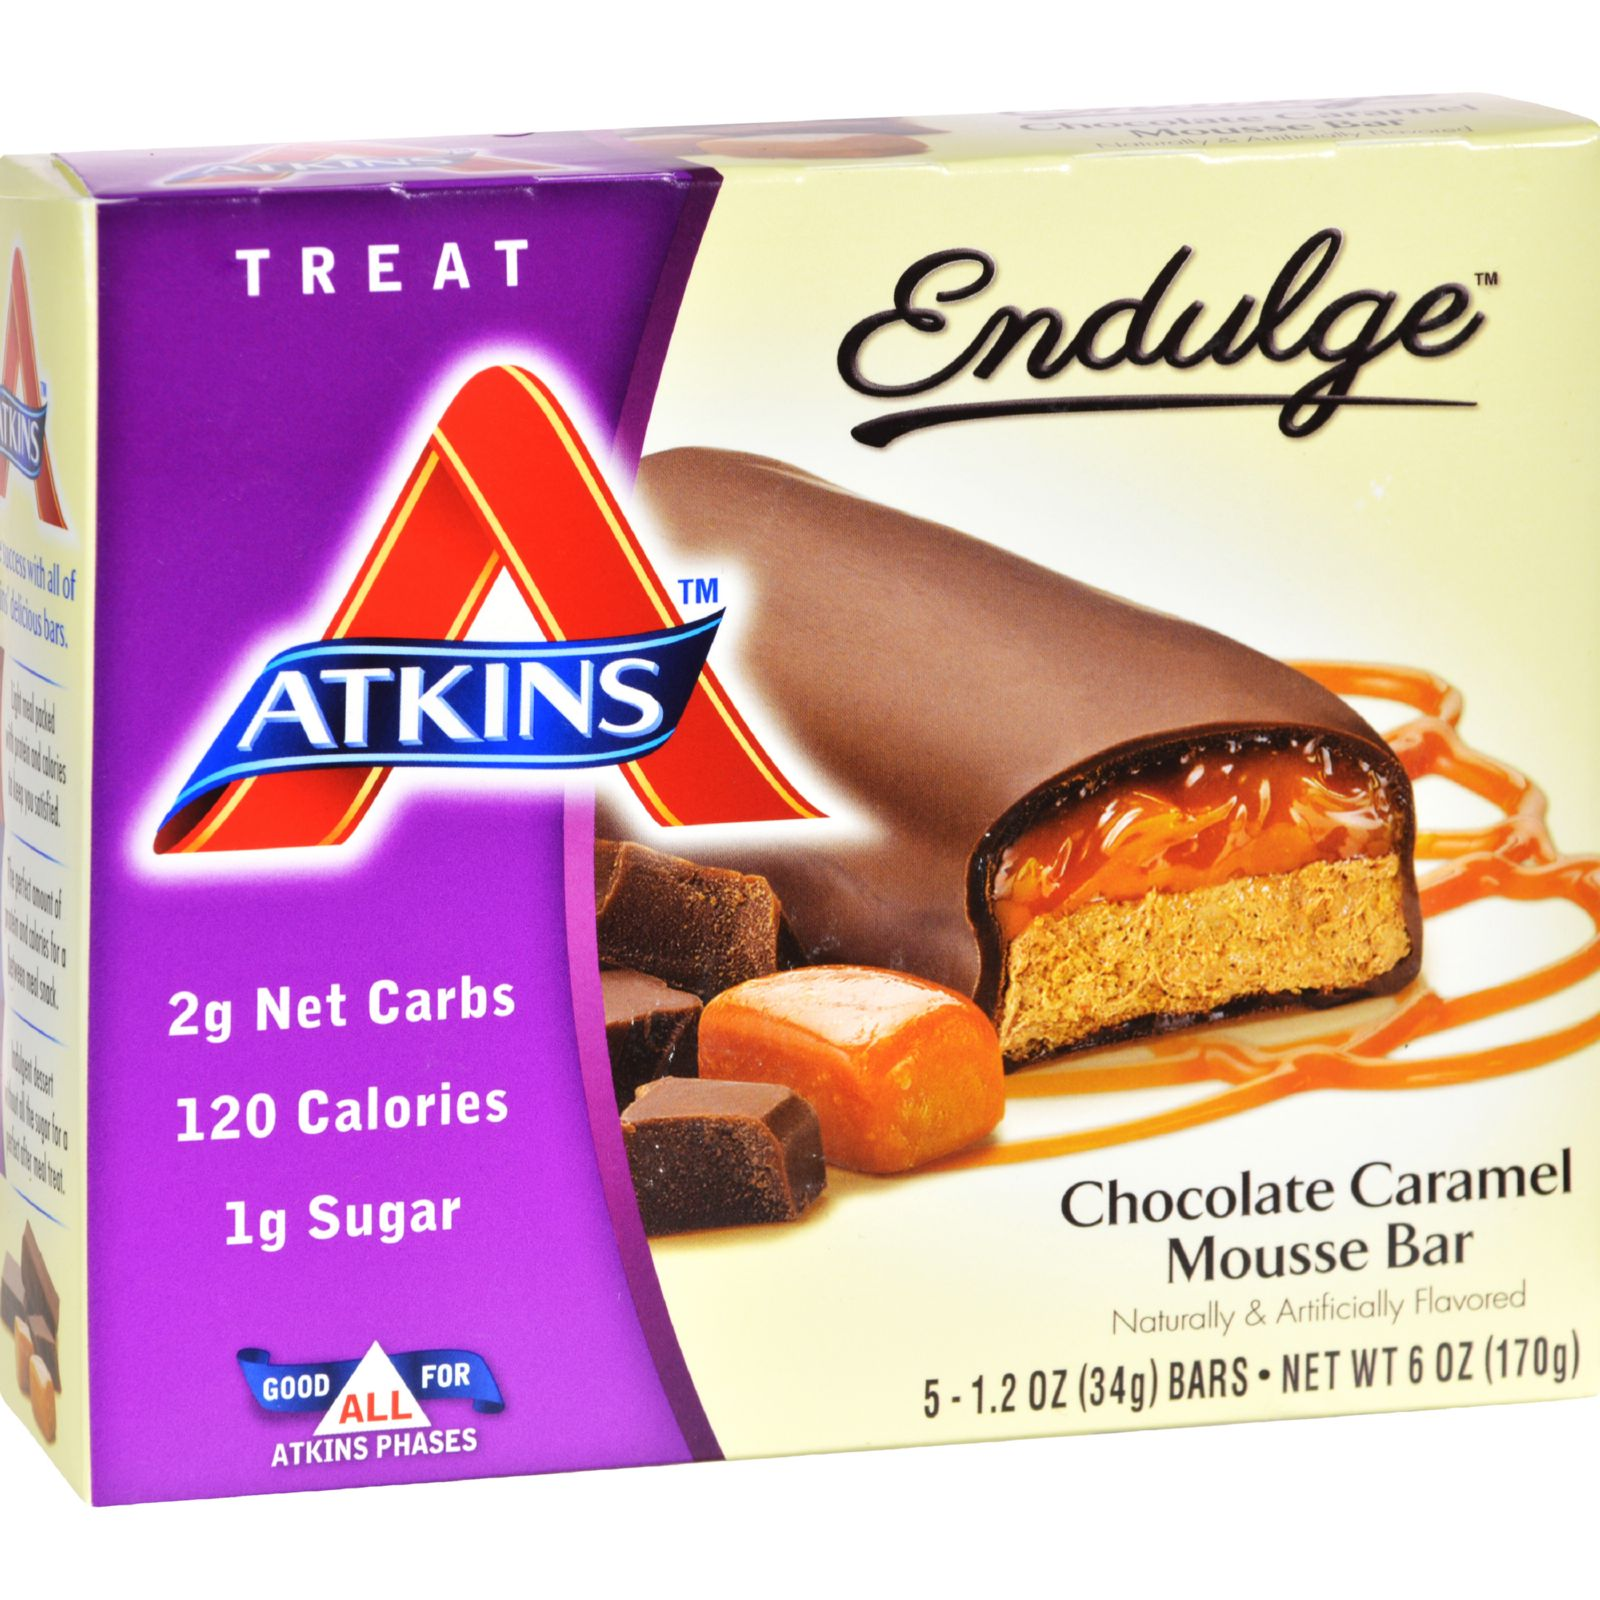 Atkins Endulge Chocolate Caramel Mousse Bar, 1.2oz, 5-pack (Treat)